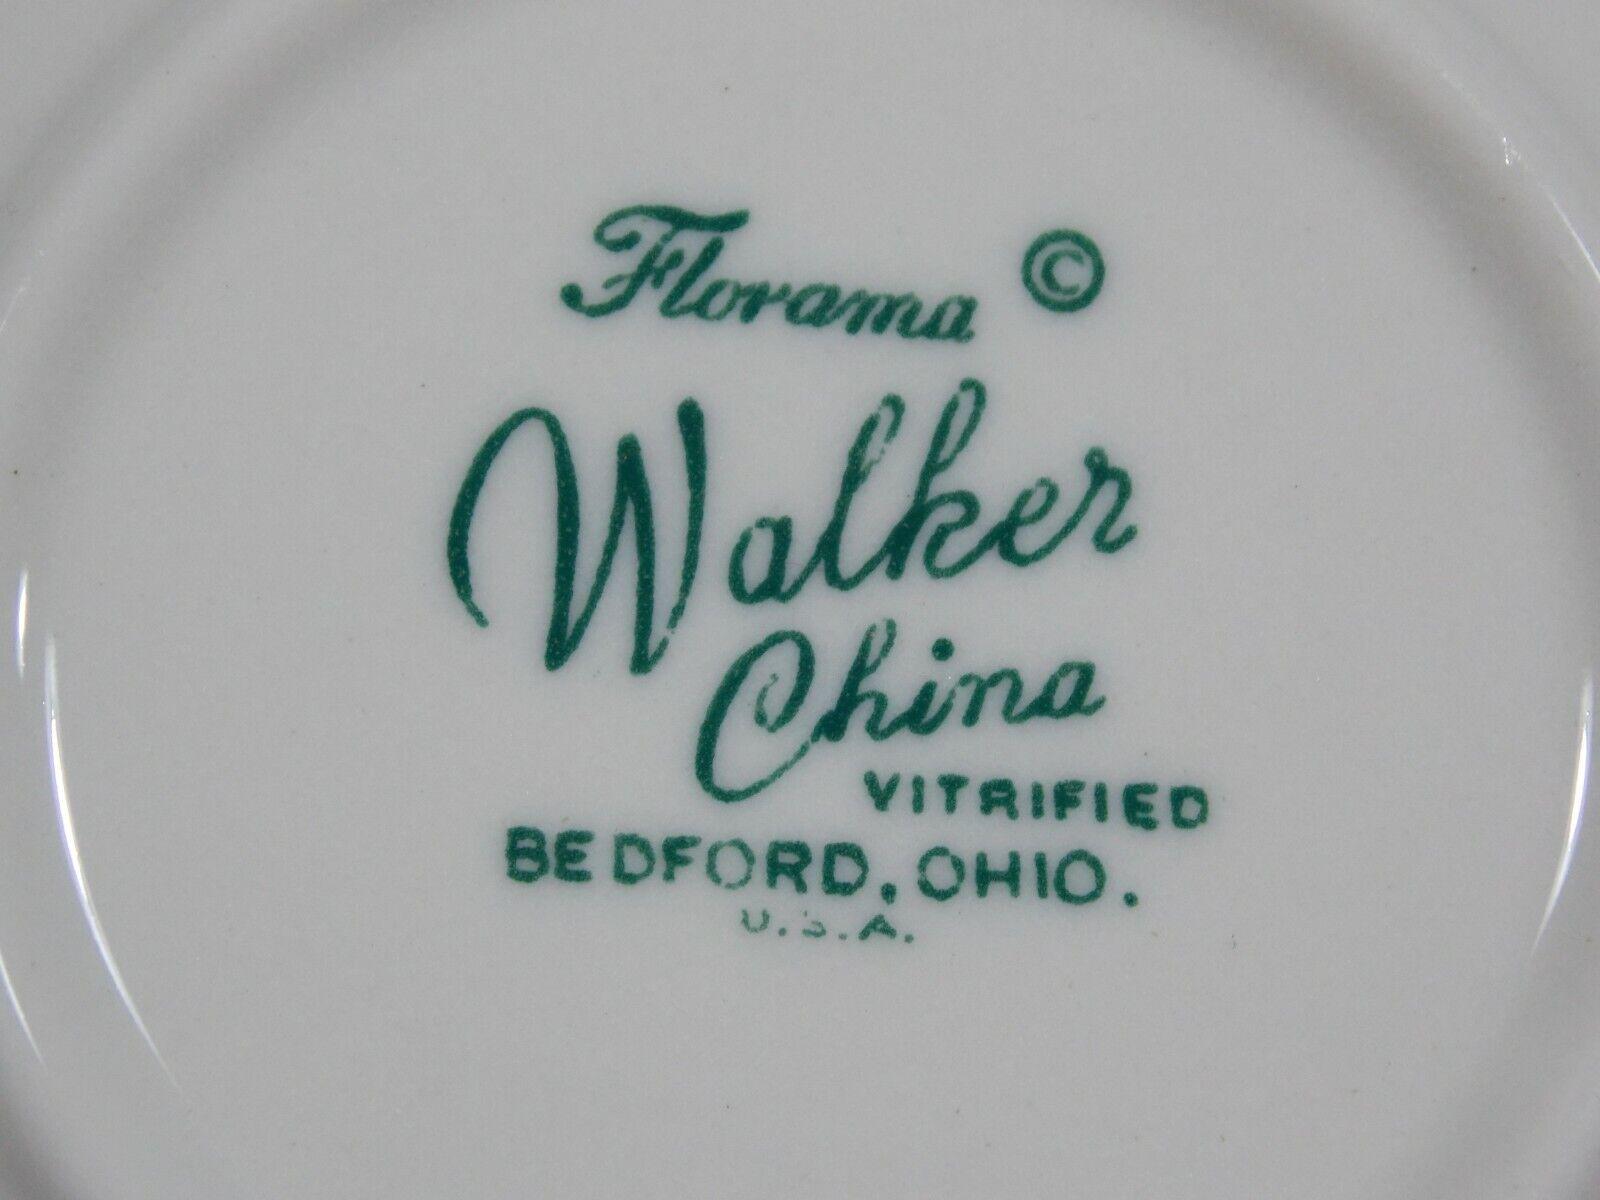 5 Vintage Walker China 4 1/4 Plate Restaurant Ware Vitrified Florama Carnival - $12.00